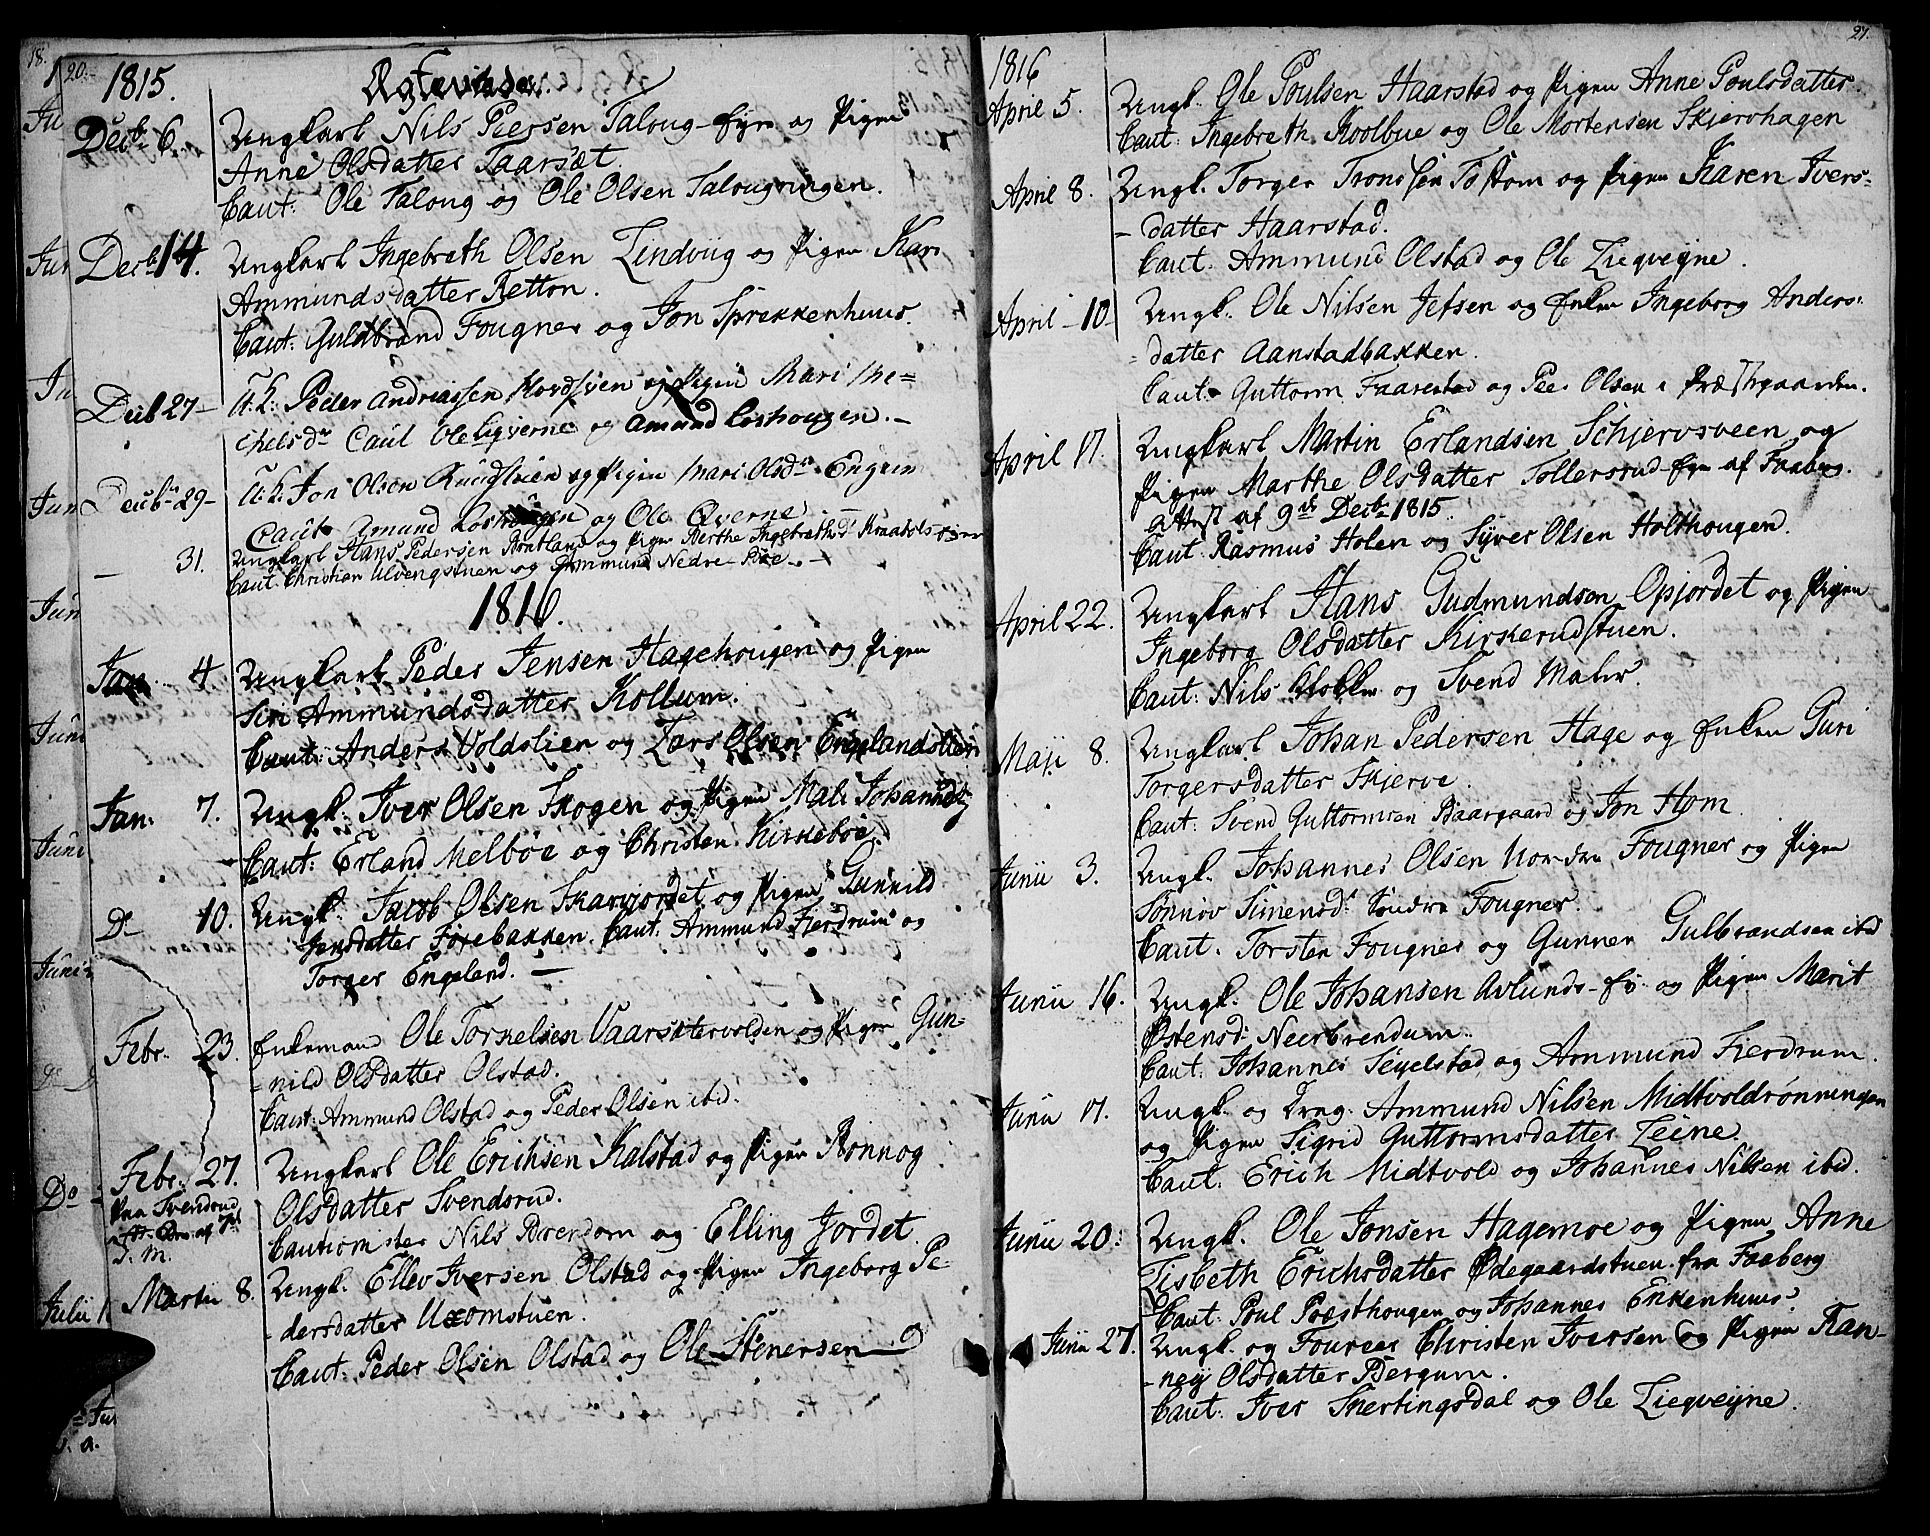 SAH, Gausdal prestekontor, Ministerialbok nr. 4, 1809-1817, s. 20-21